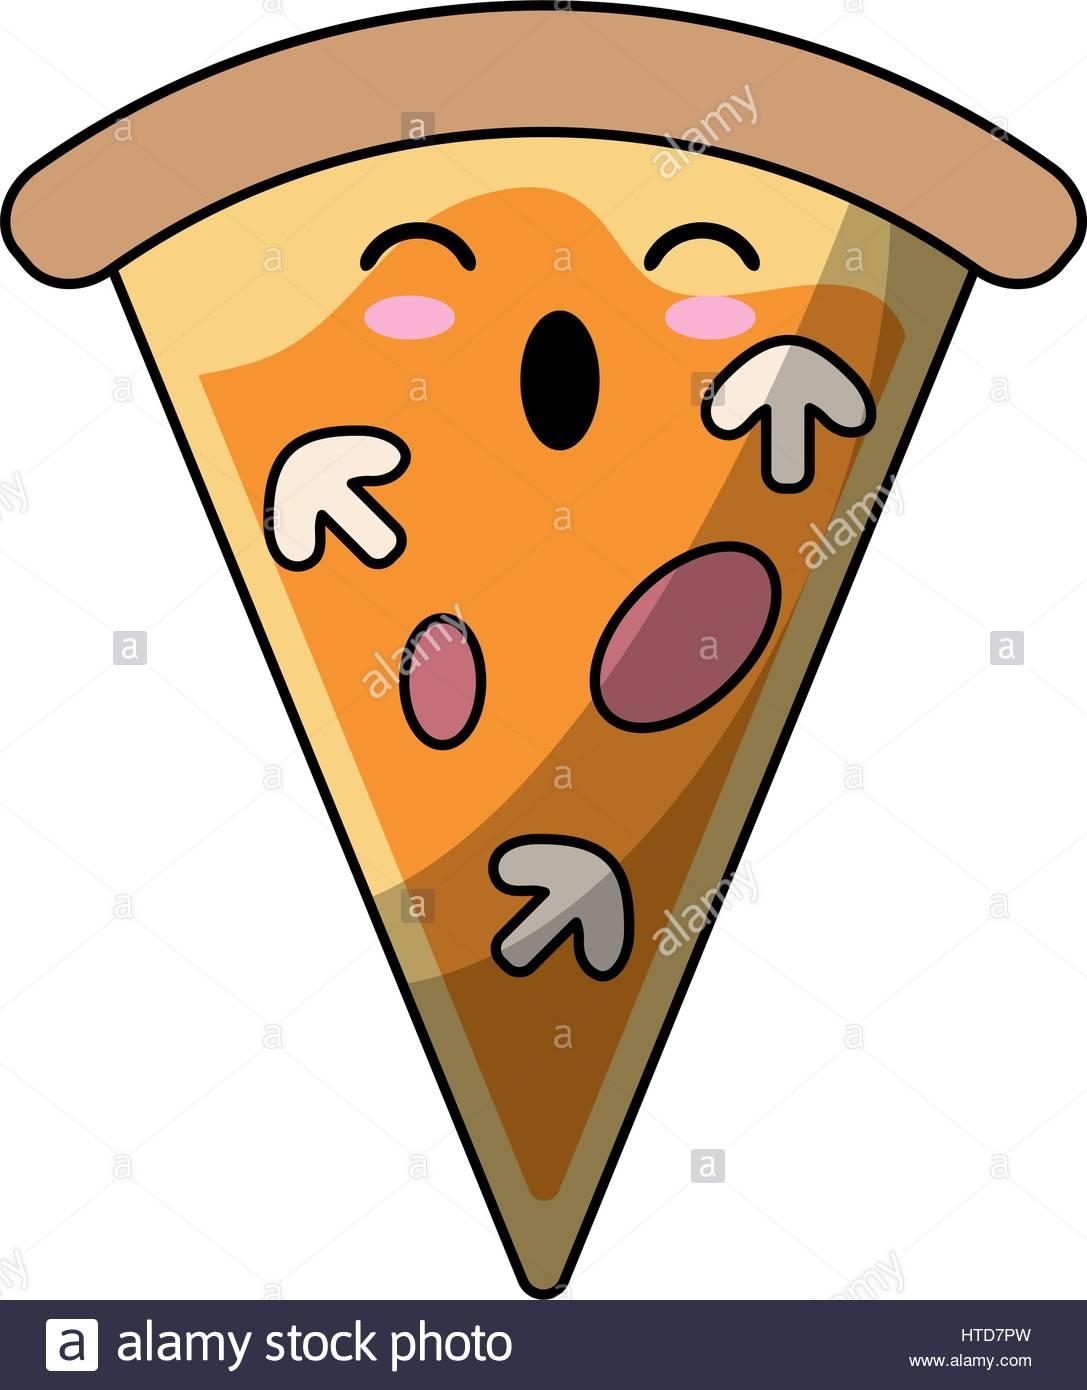 1087x1390 Kawaii Tasty Pizza Slice Icon Stock Vector Art Amp Illustration